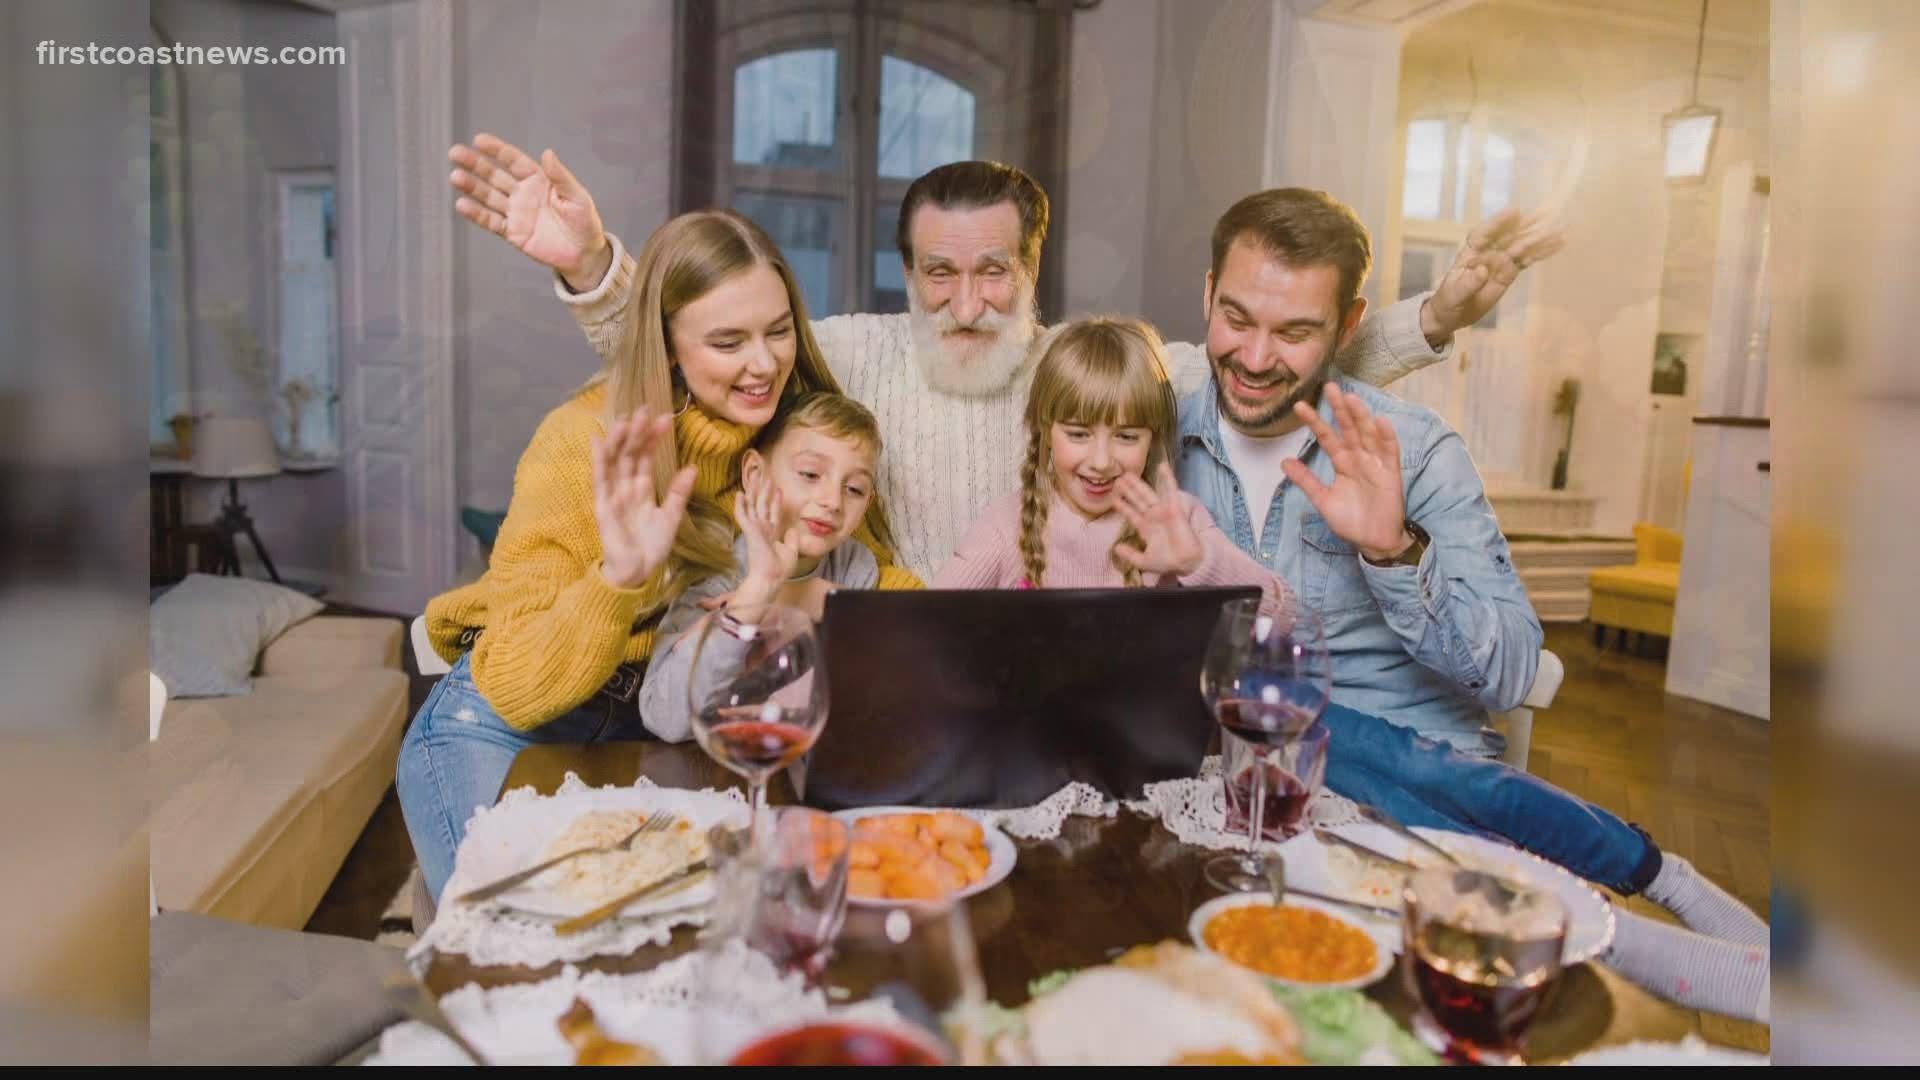 The Buzz: Families should 'prepare' for a virtual Thanksgiving, health officials say | weareiowa.com